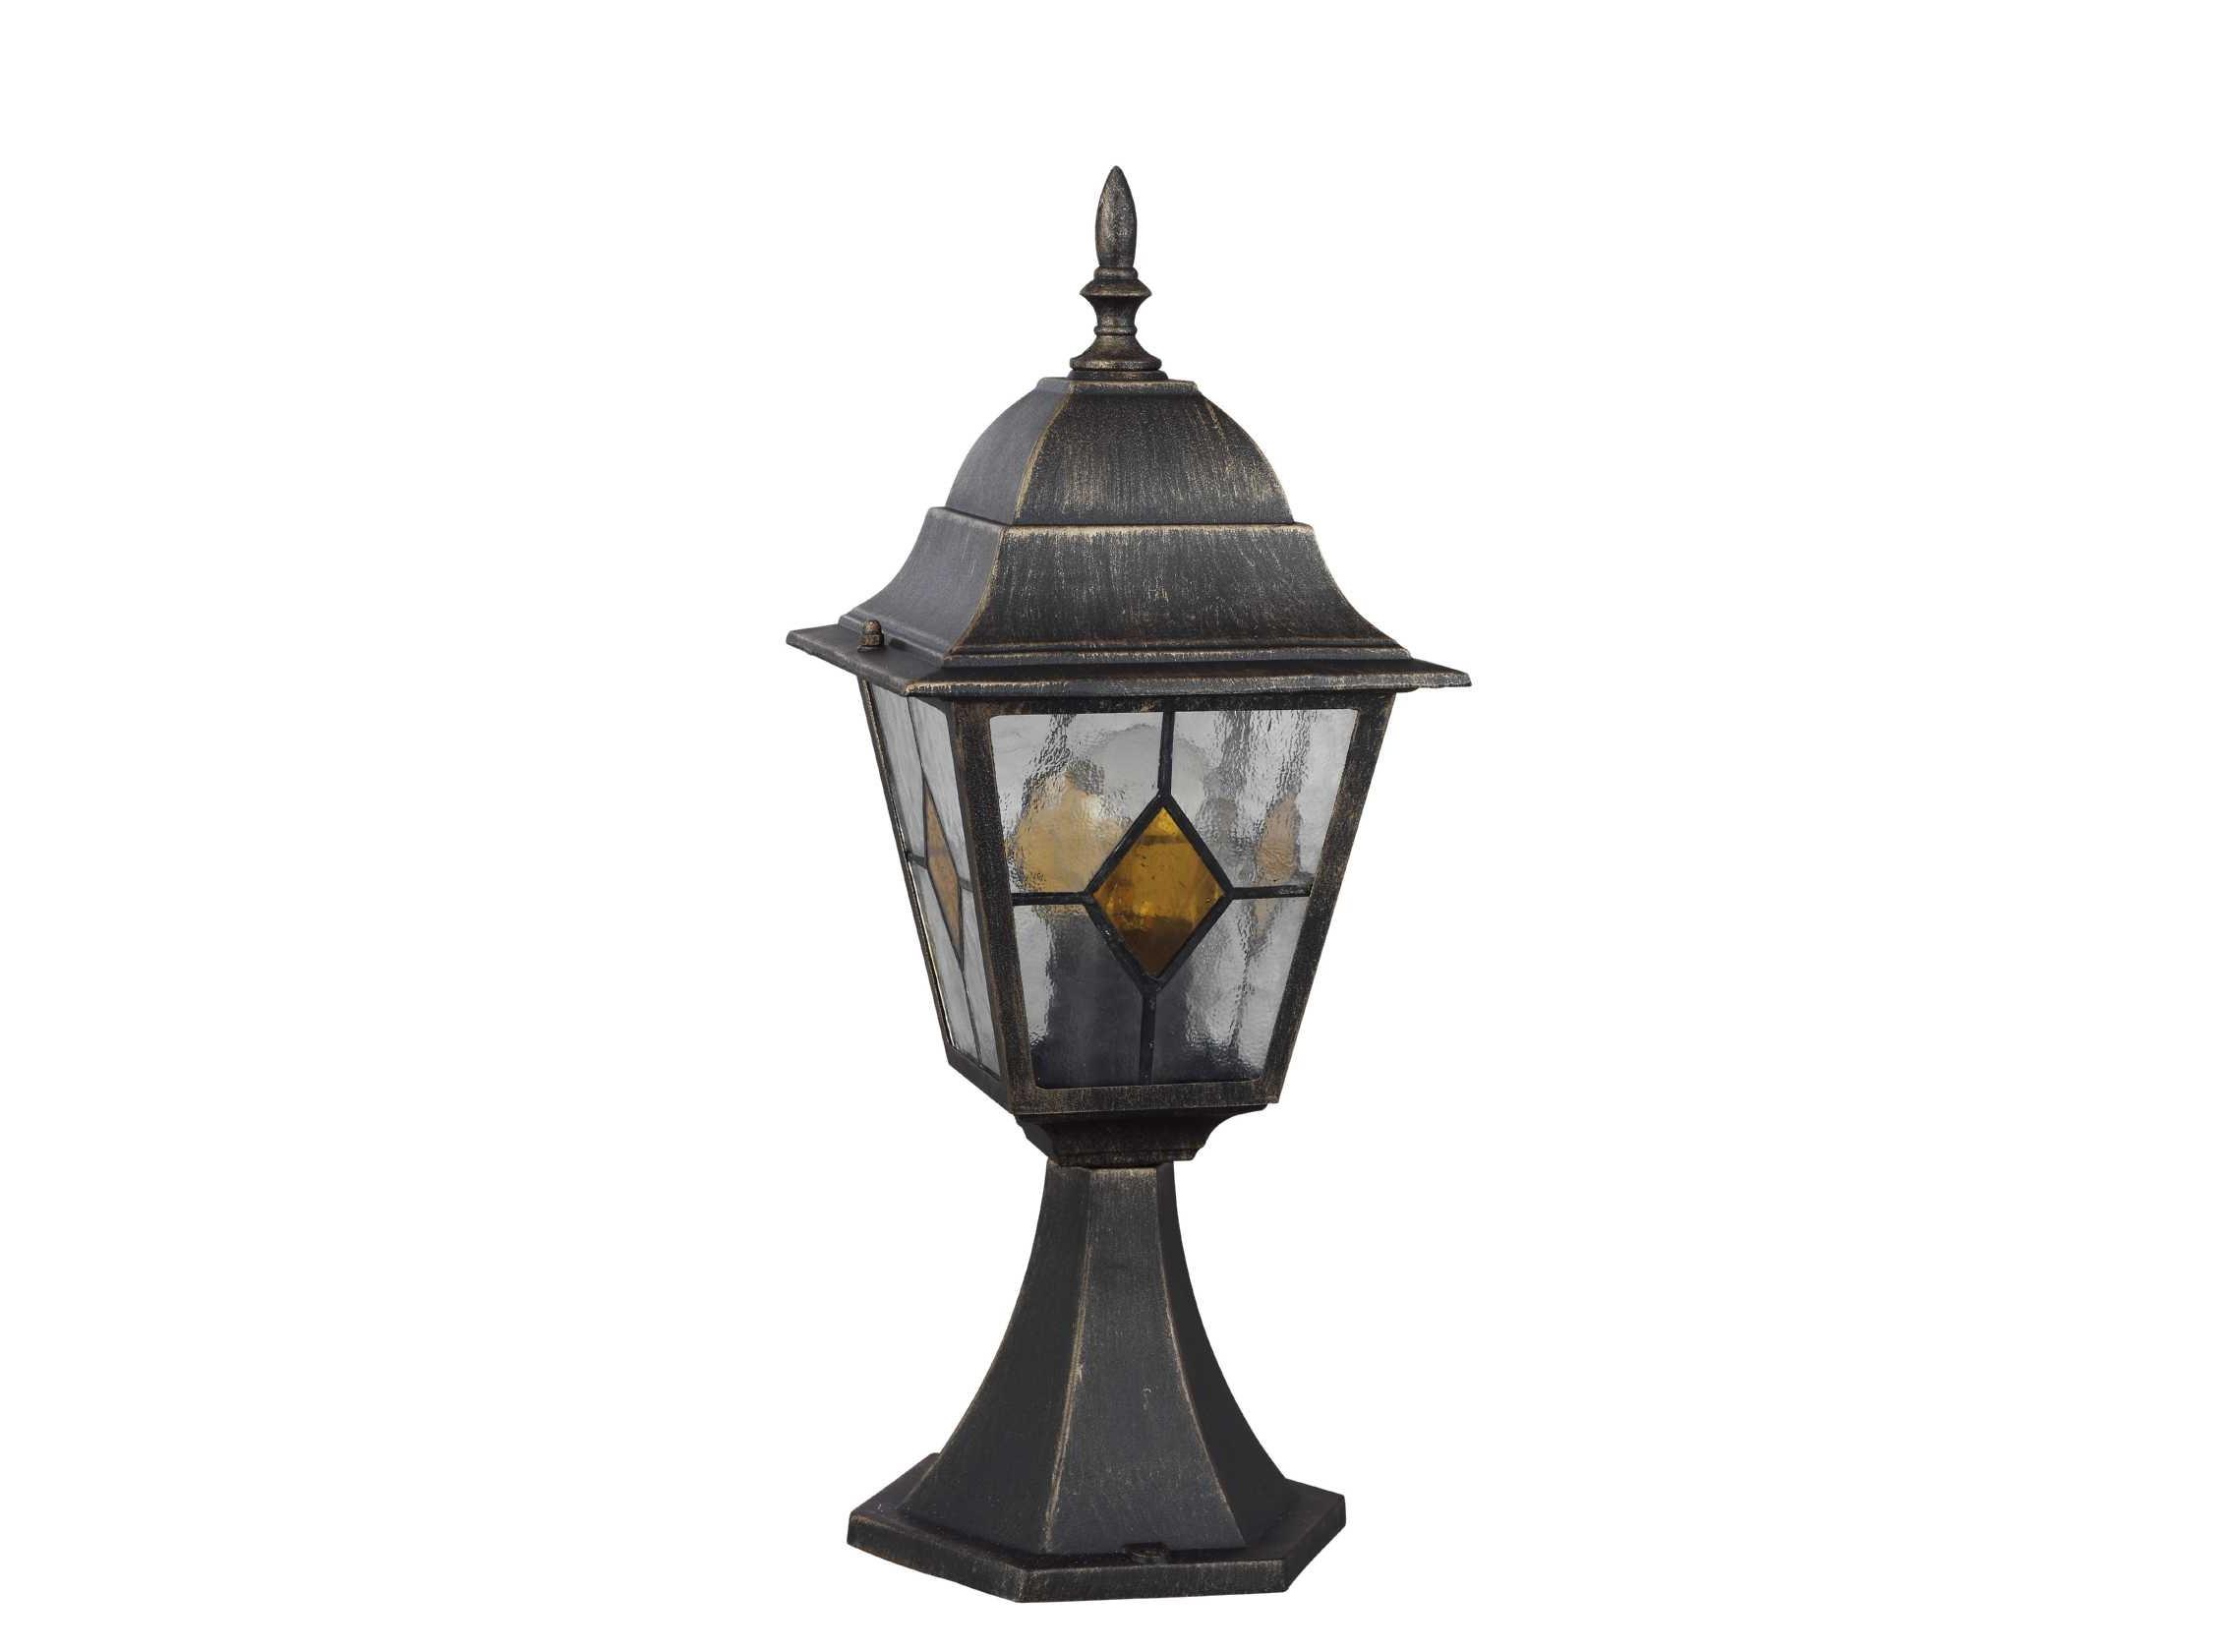 Лампа  JasonУличные наземные светильники<br>&amp;lt;div&amp;gt;Вид цоколя: Е27&amp;lt;/div&amp;gt;&amp;lt;div&amp;gt;Мощность лампы: 100W&amp;lt;/div&amp;gt;&amp;lt;div&amp;gt;Количество ламп: 1&amp;lt;/div&amp;gt;&amp;lt;div&amp;gt;Наличие ламп: нет&amp;lt;/div&amp;gt;<br><br>Material: Металл<br>Ширина см: 18<br>Высота см: 44<br>Глубина см: 17